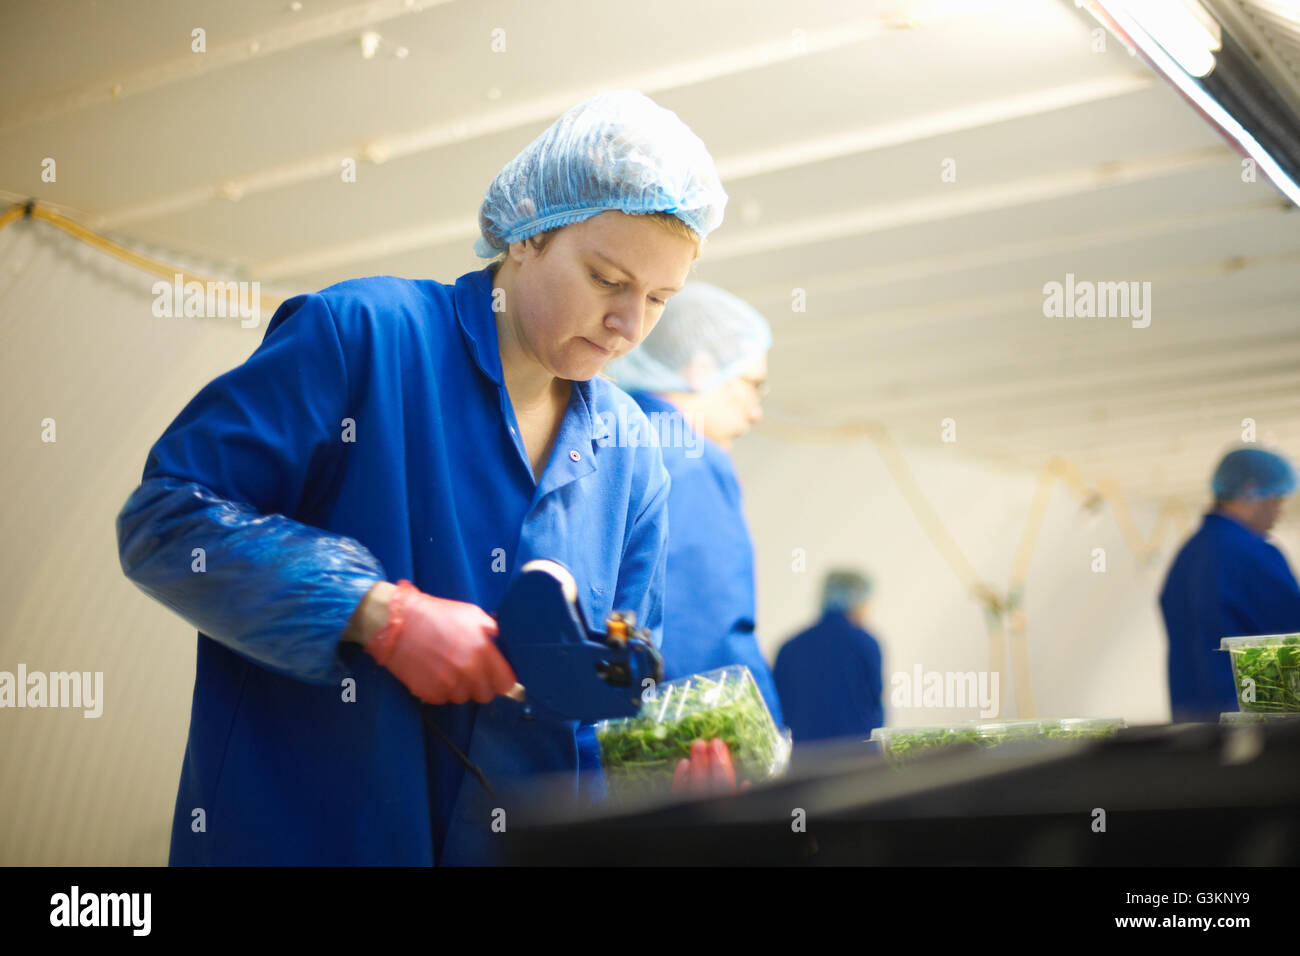 Woman wearing hair net on production line using price gun - Stock Image